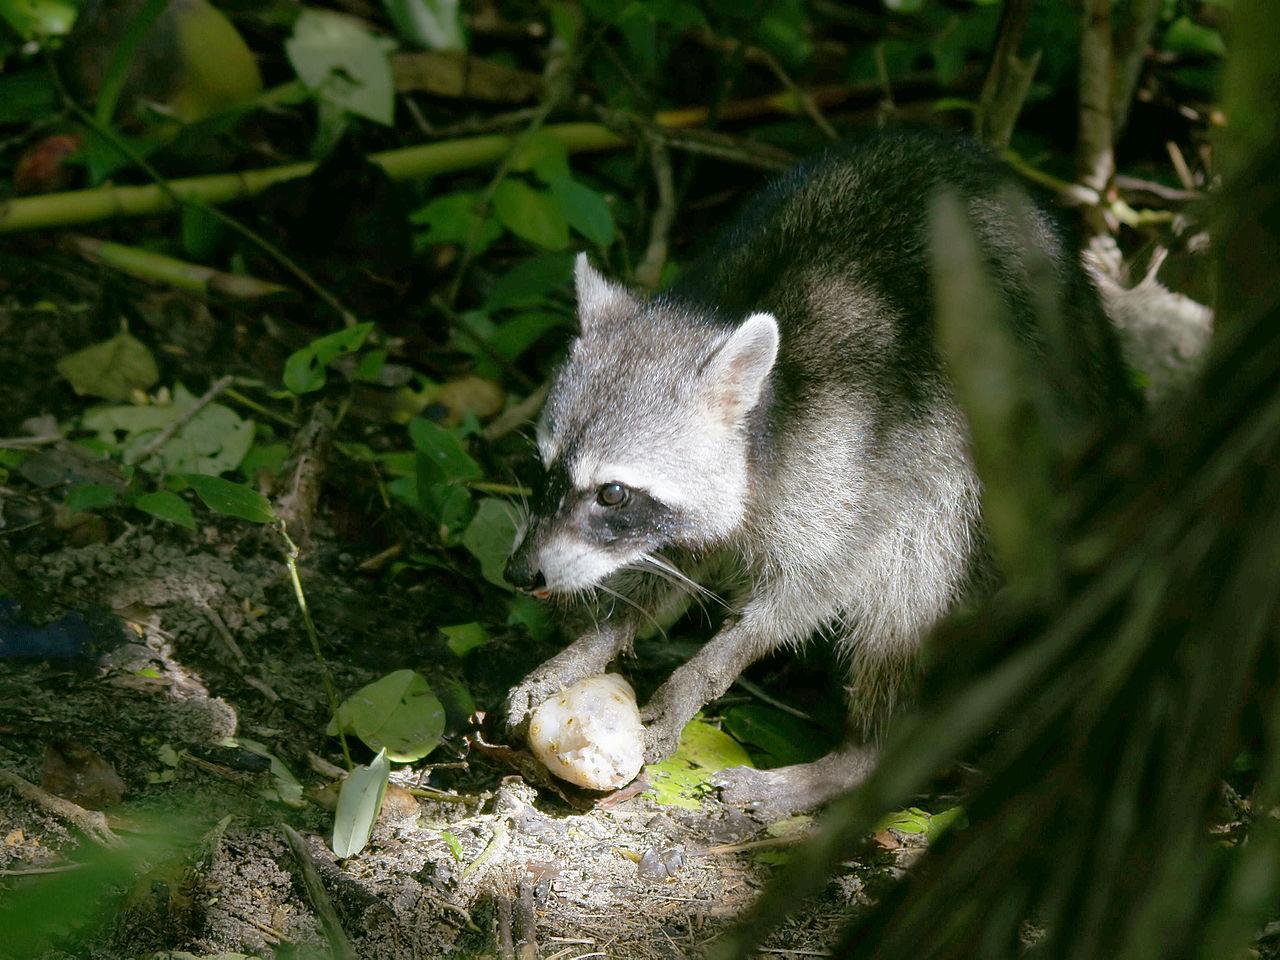 raccoon eating © Hans Hillewaert Wikimedia Commons